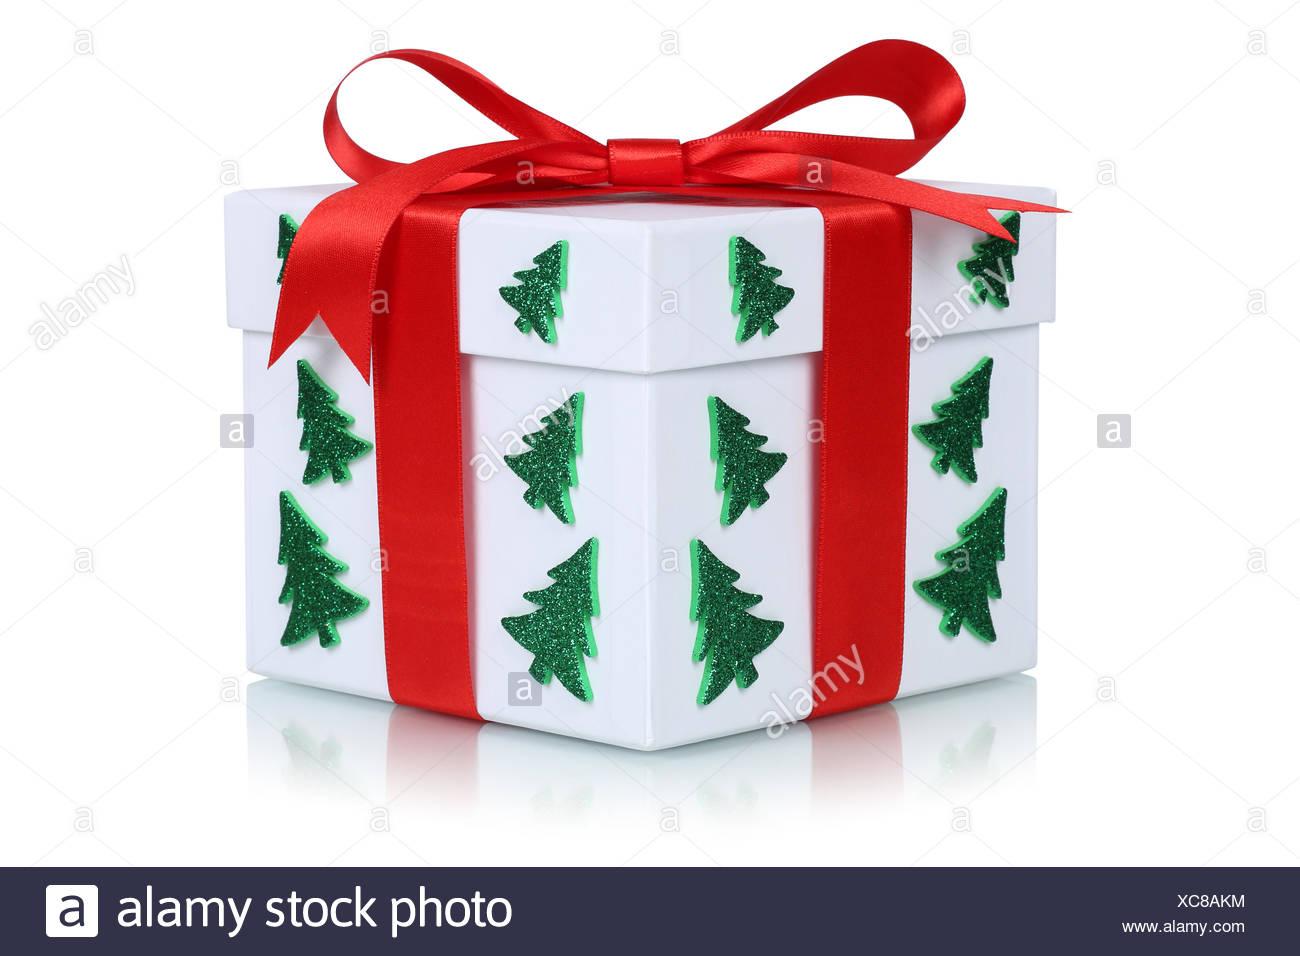 Weihnachtsgeschenk Weihnachten.Weihnachtsgeschenk Geschenk An Weihnachten Stock Photo 282925768